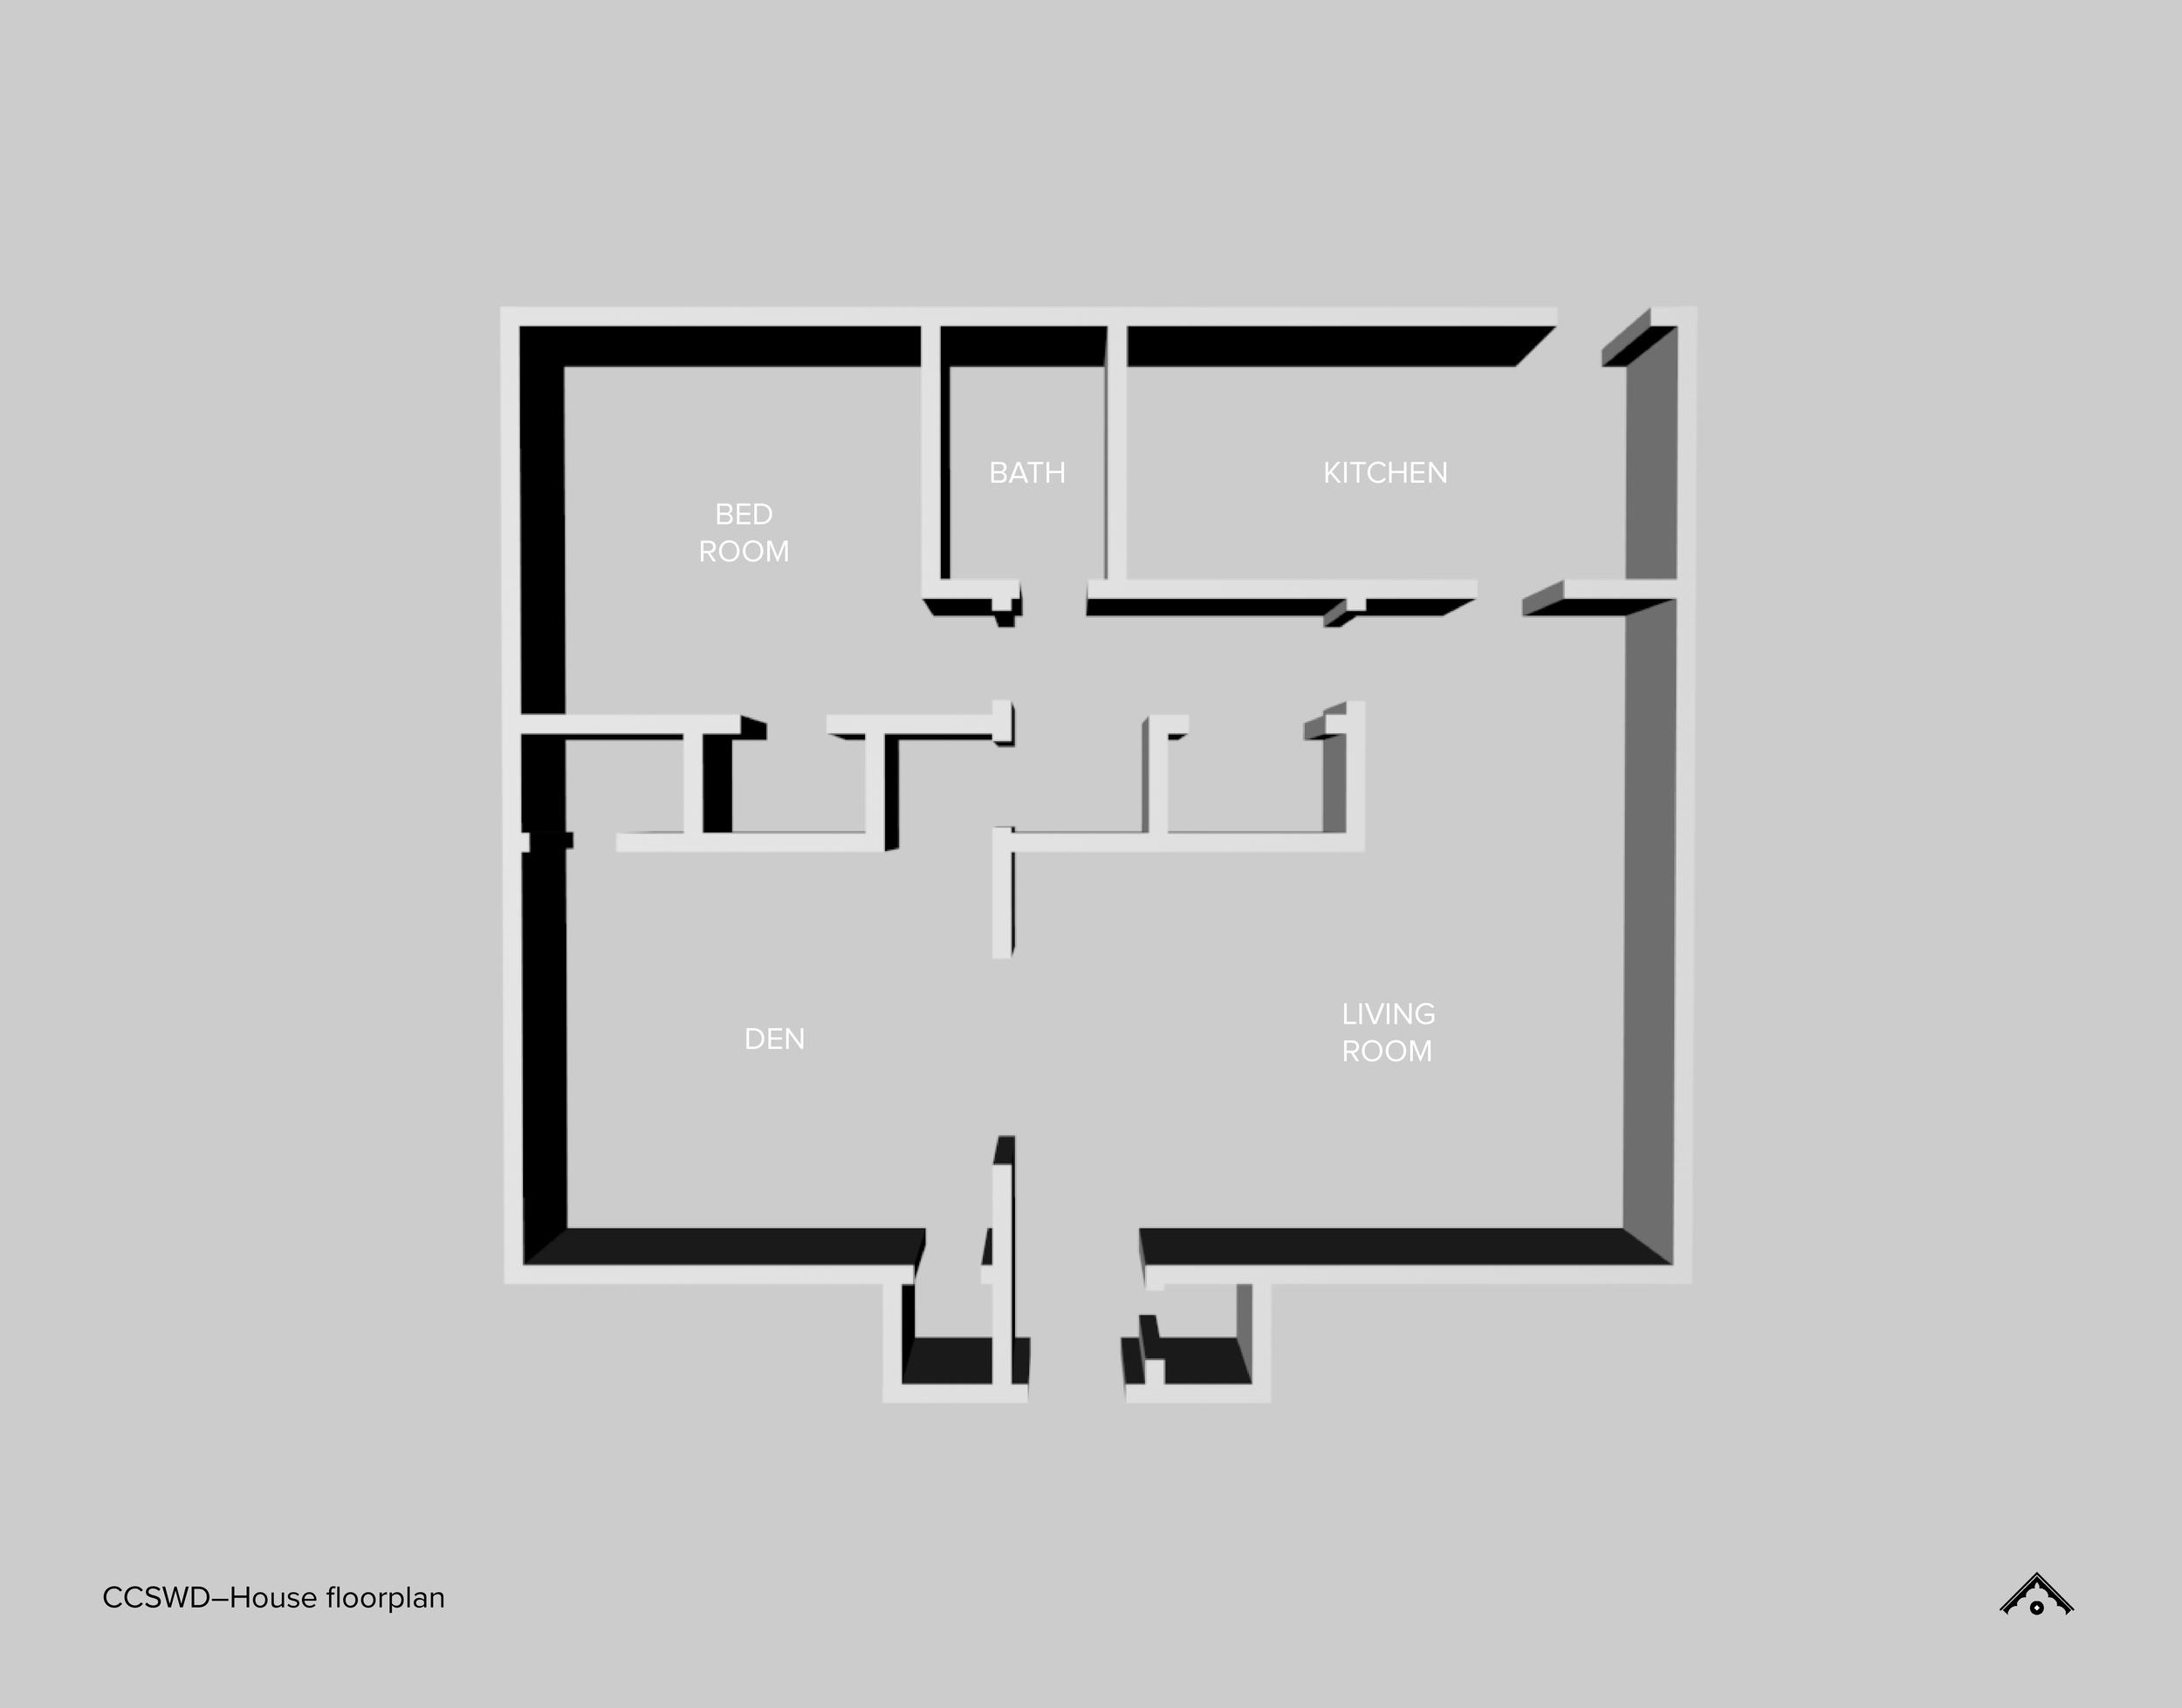 CCSWD-house_floorplan.jpg